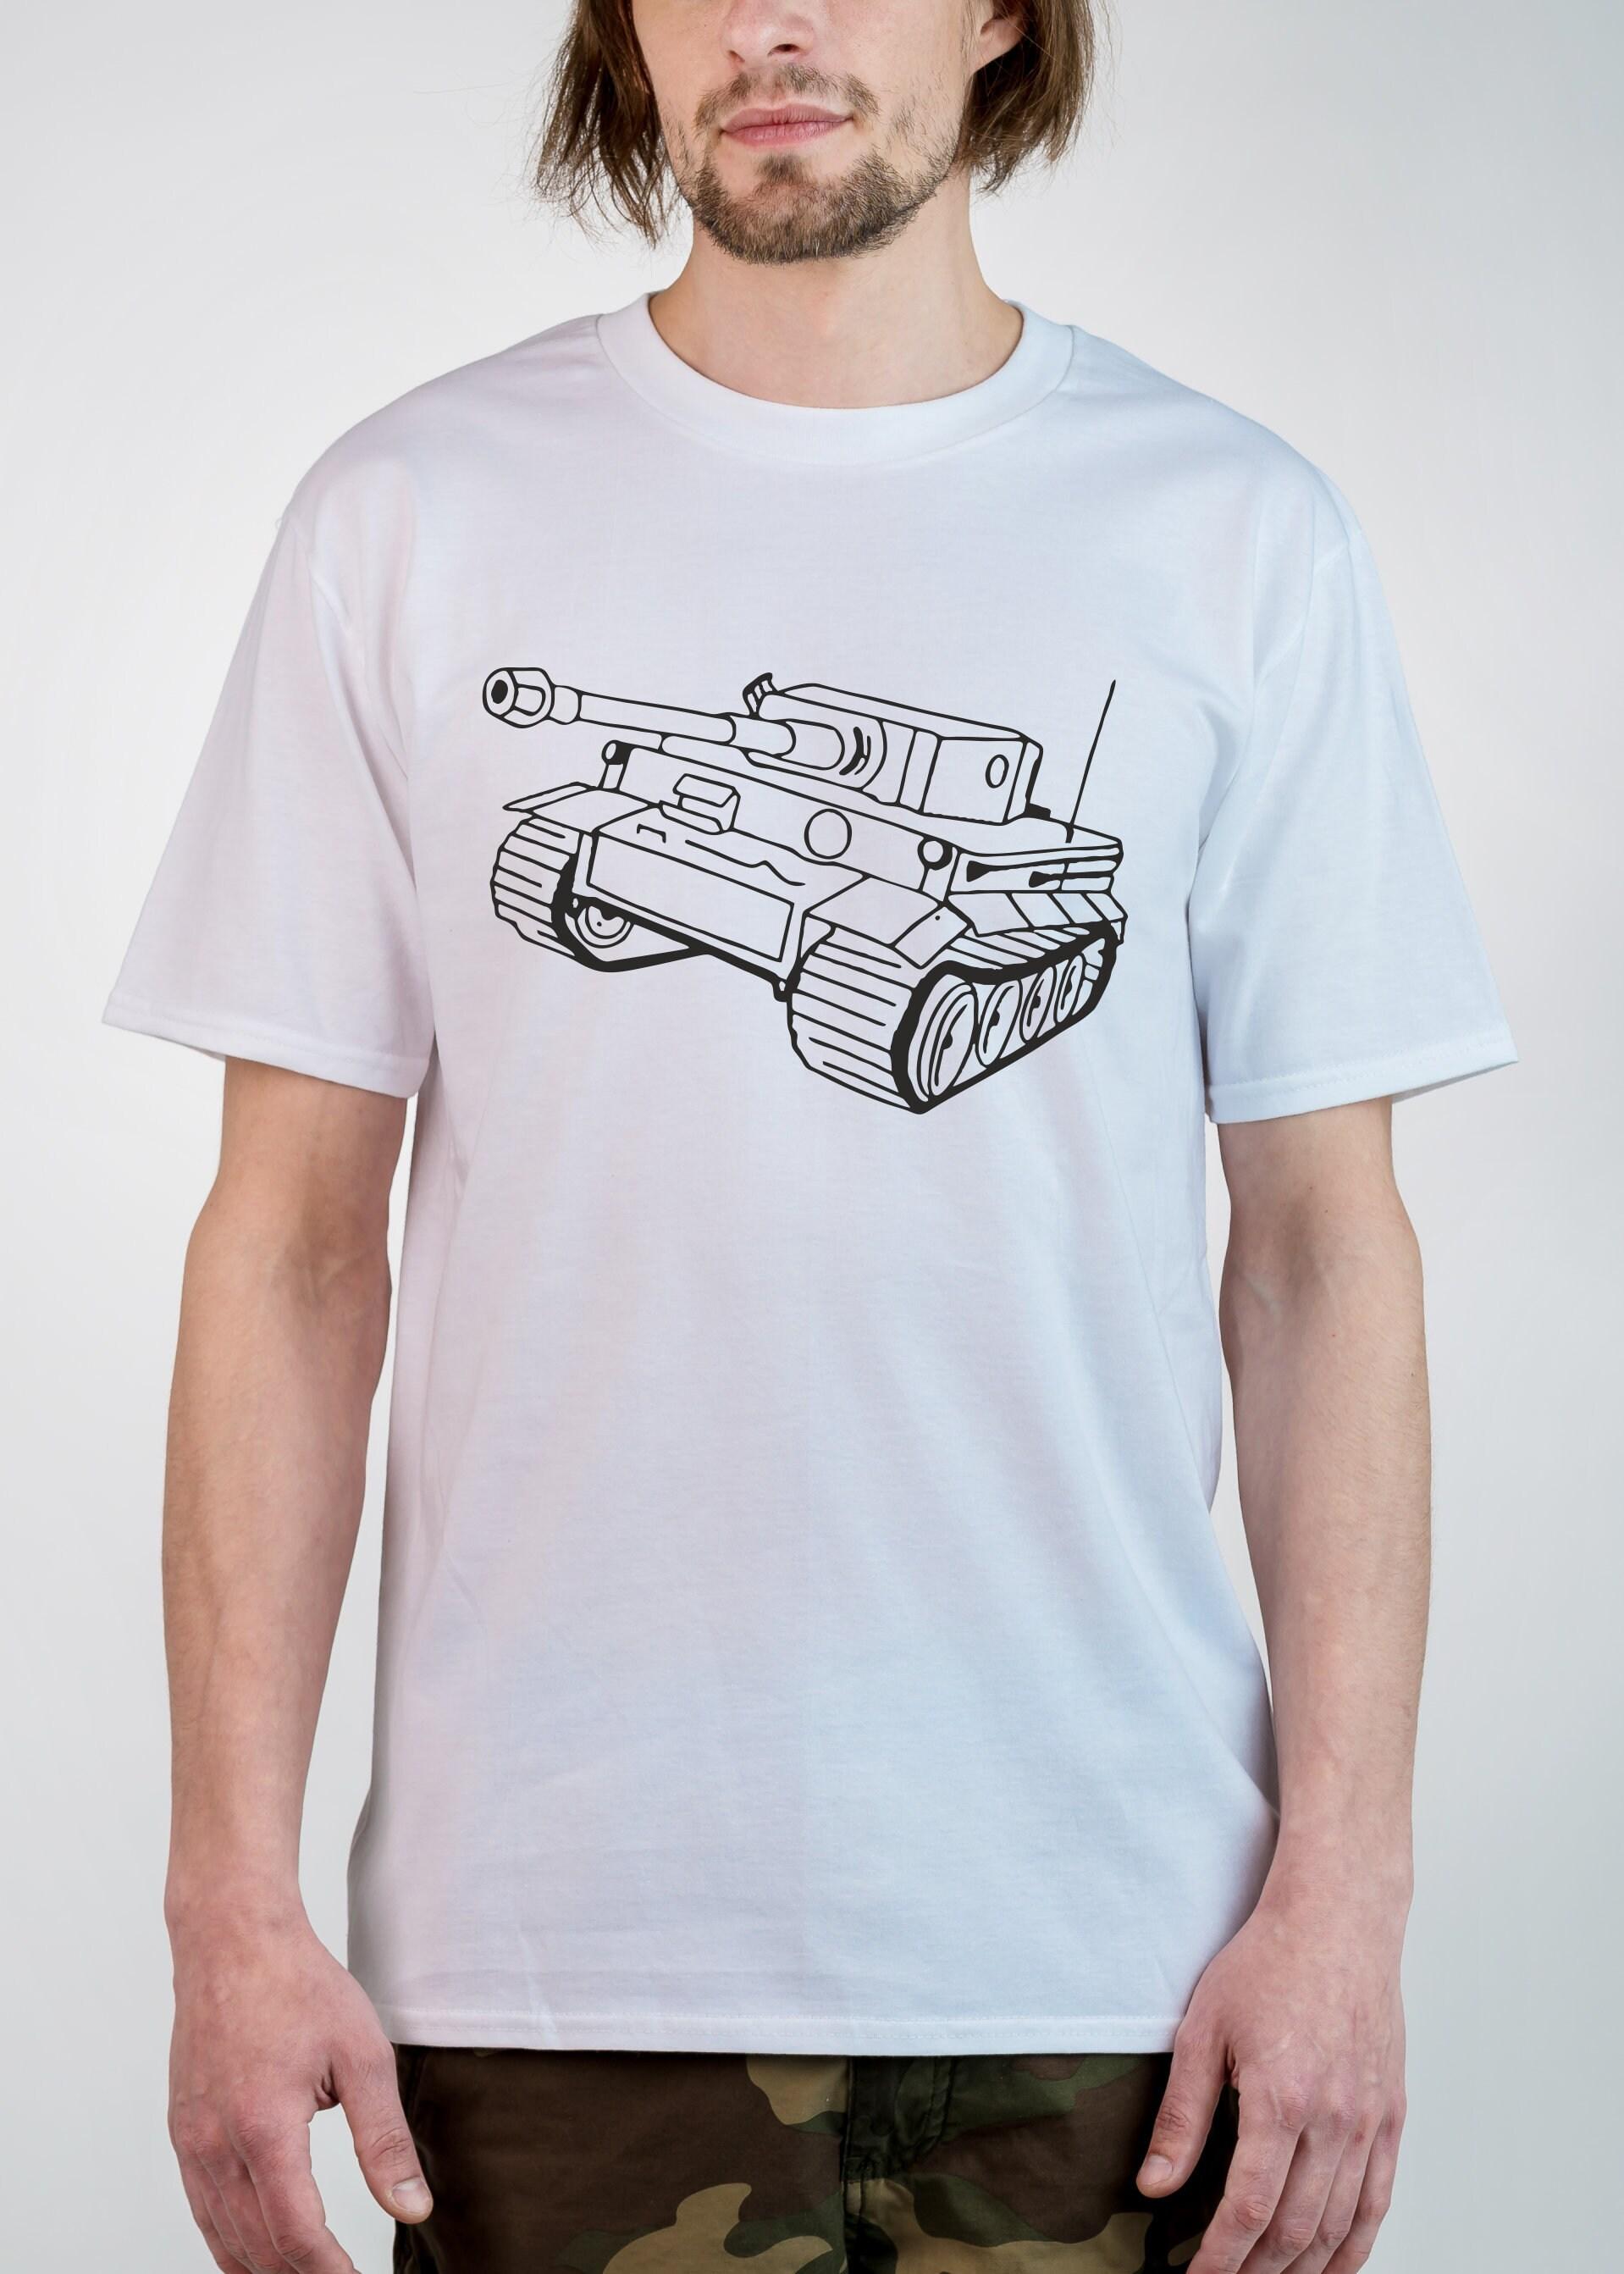 Tiger Tank T Shirt German Tank Tshirt Gift For Gamer Shirt For Etsy